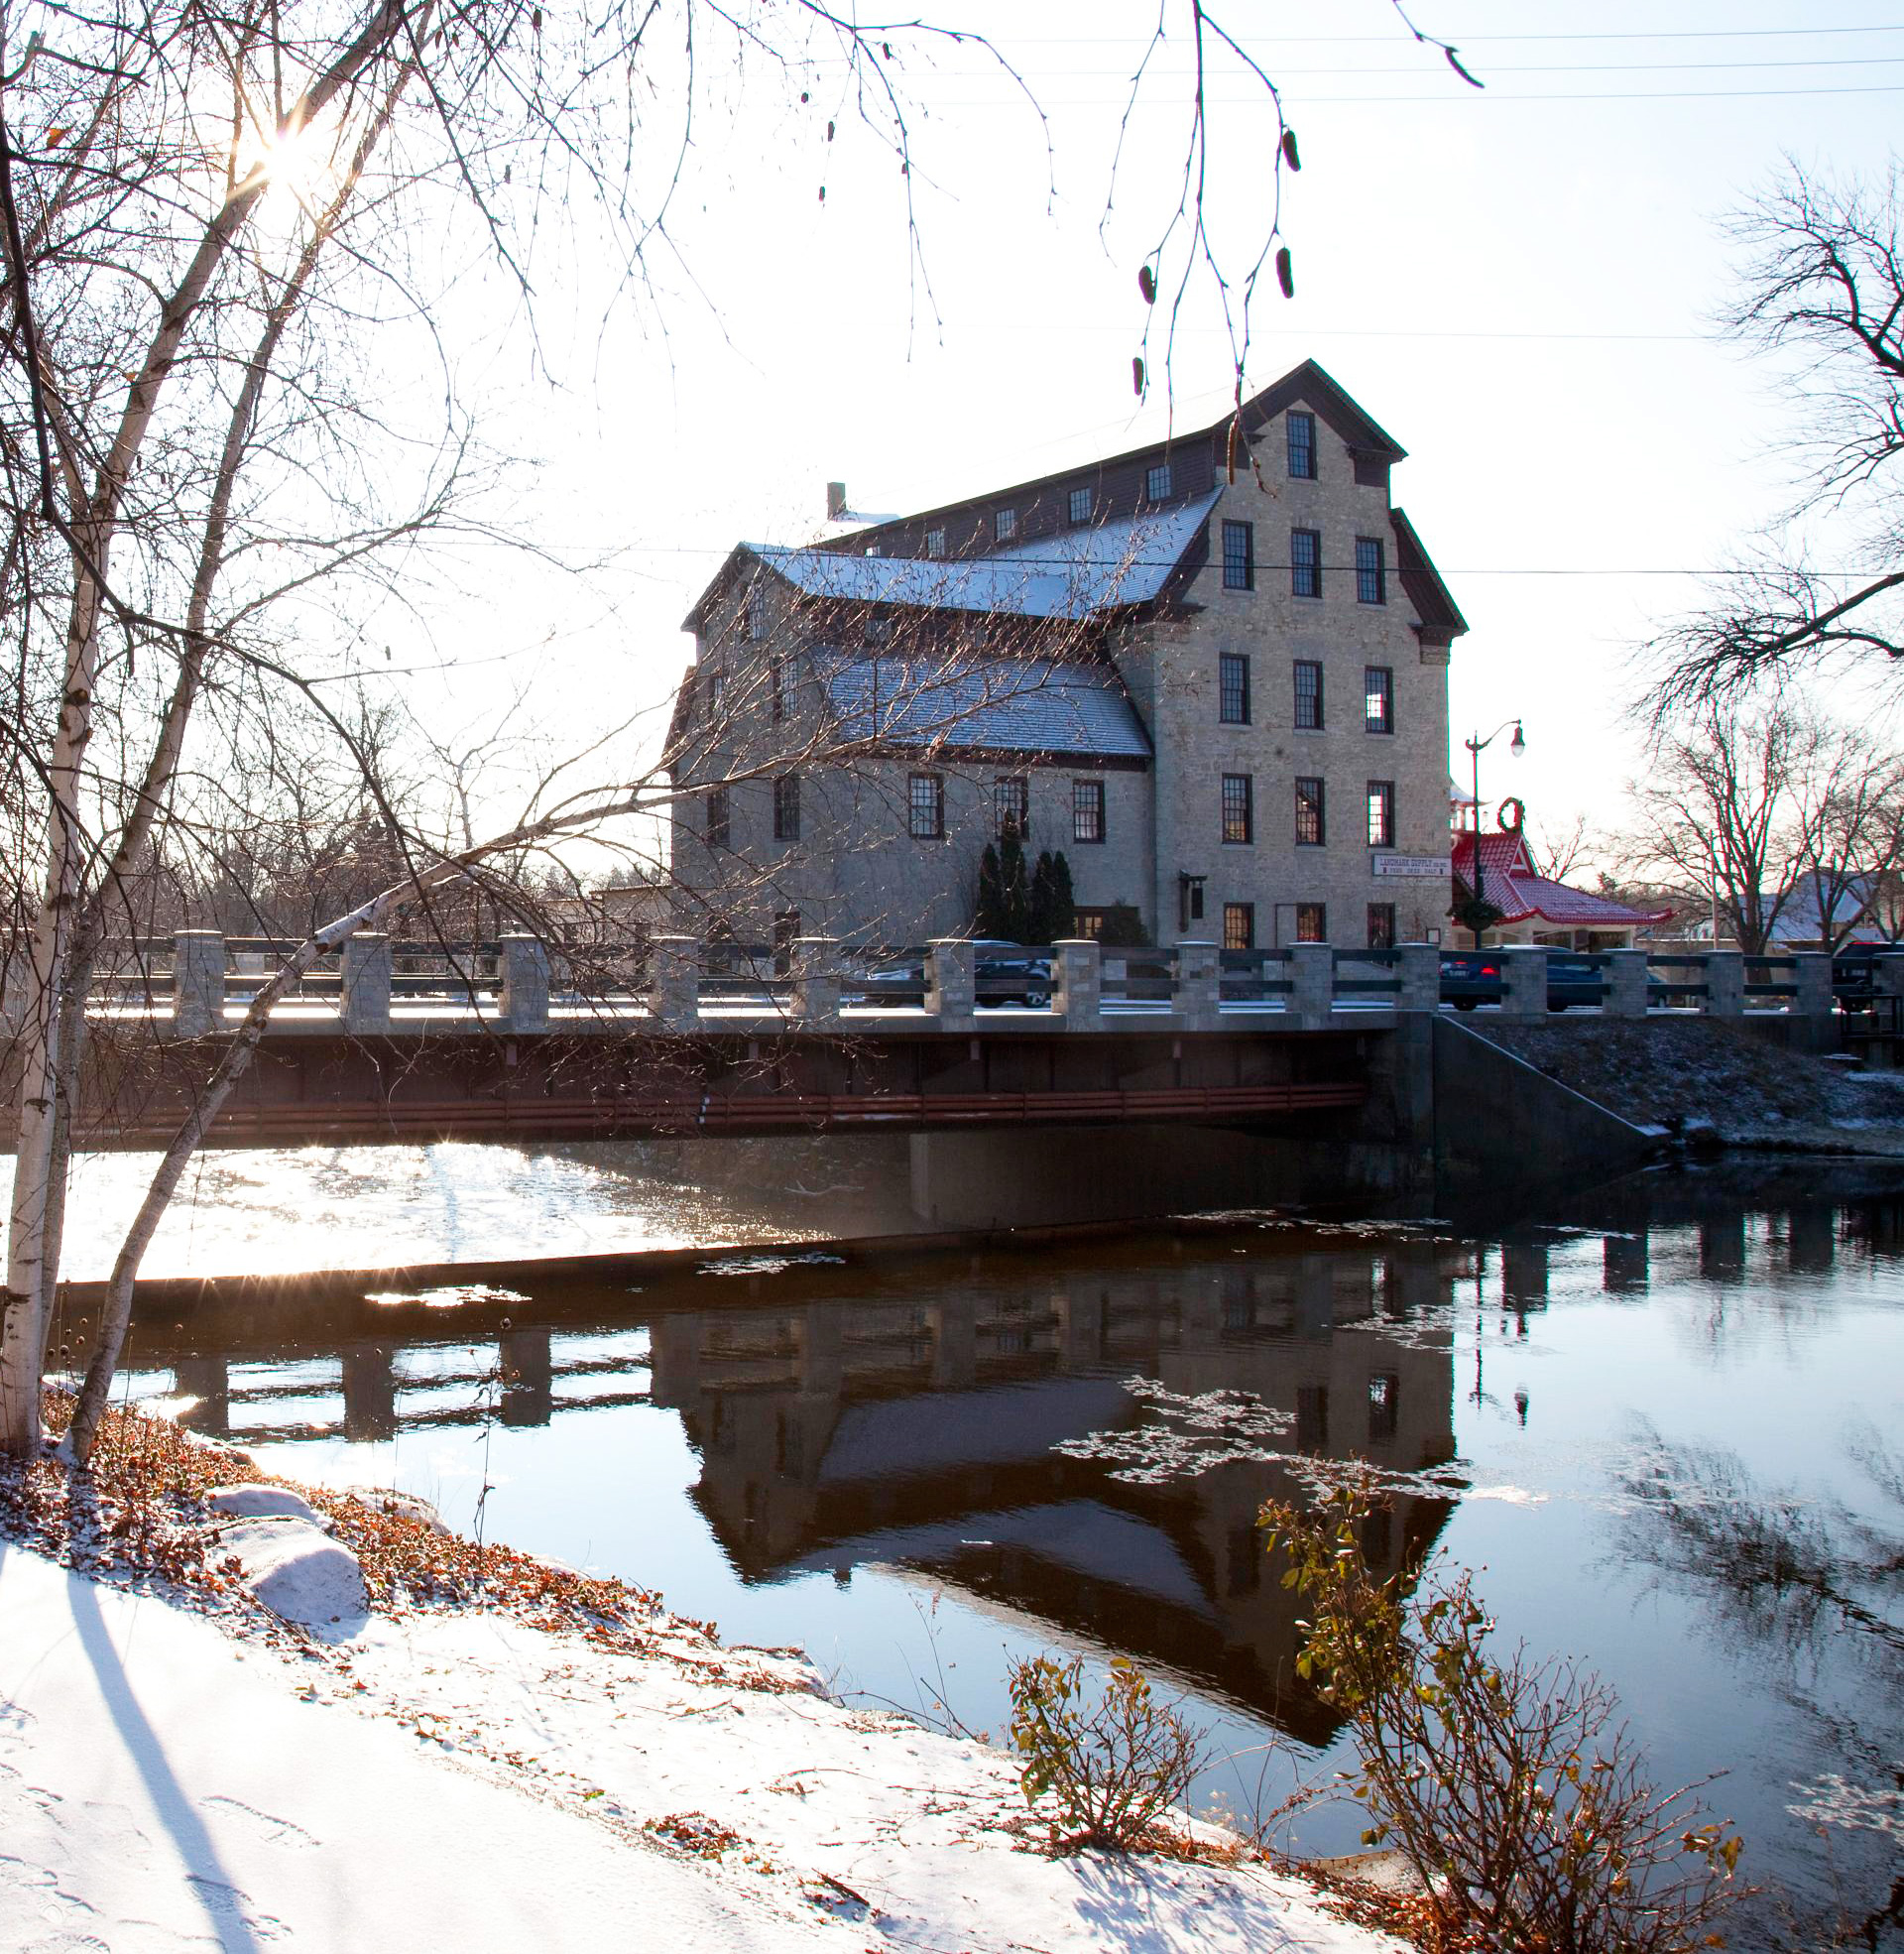 Cedarburg, Wisconsin: 113 miles north of Chicago